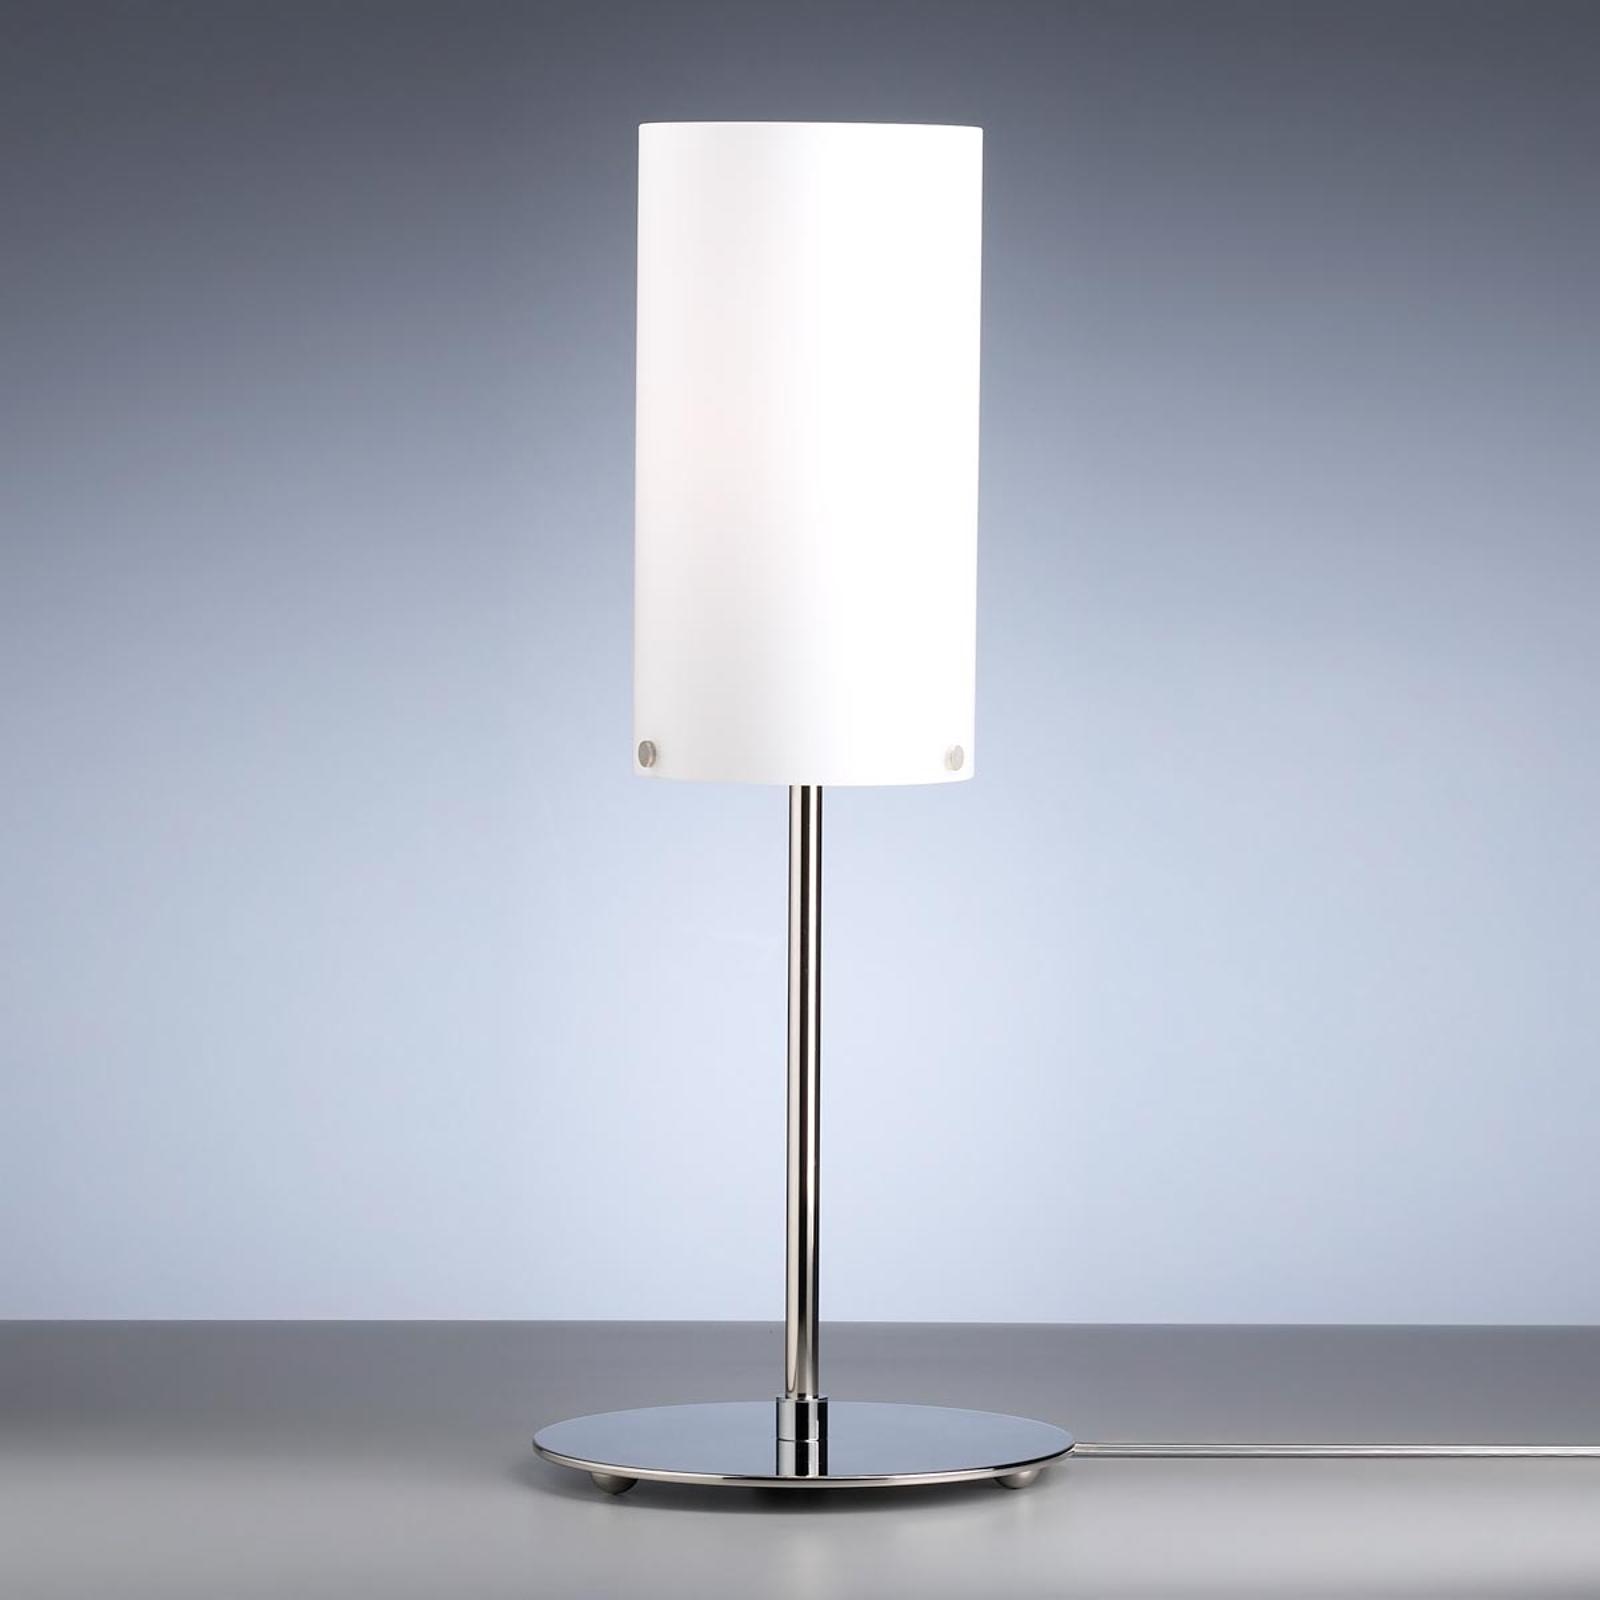 Cilindervormige tafellamp van Walter Schnepel